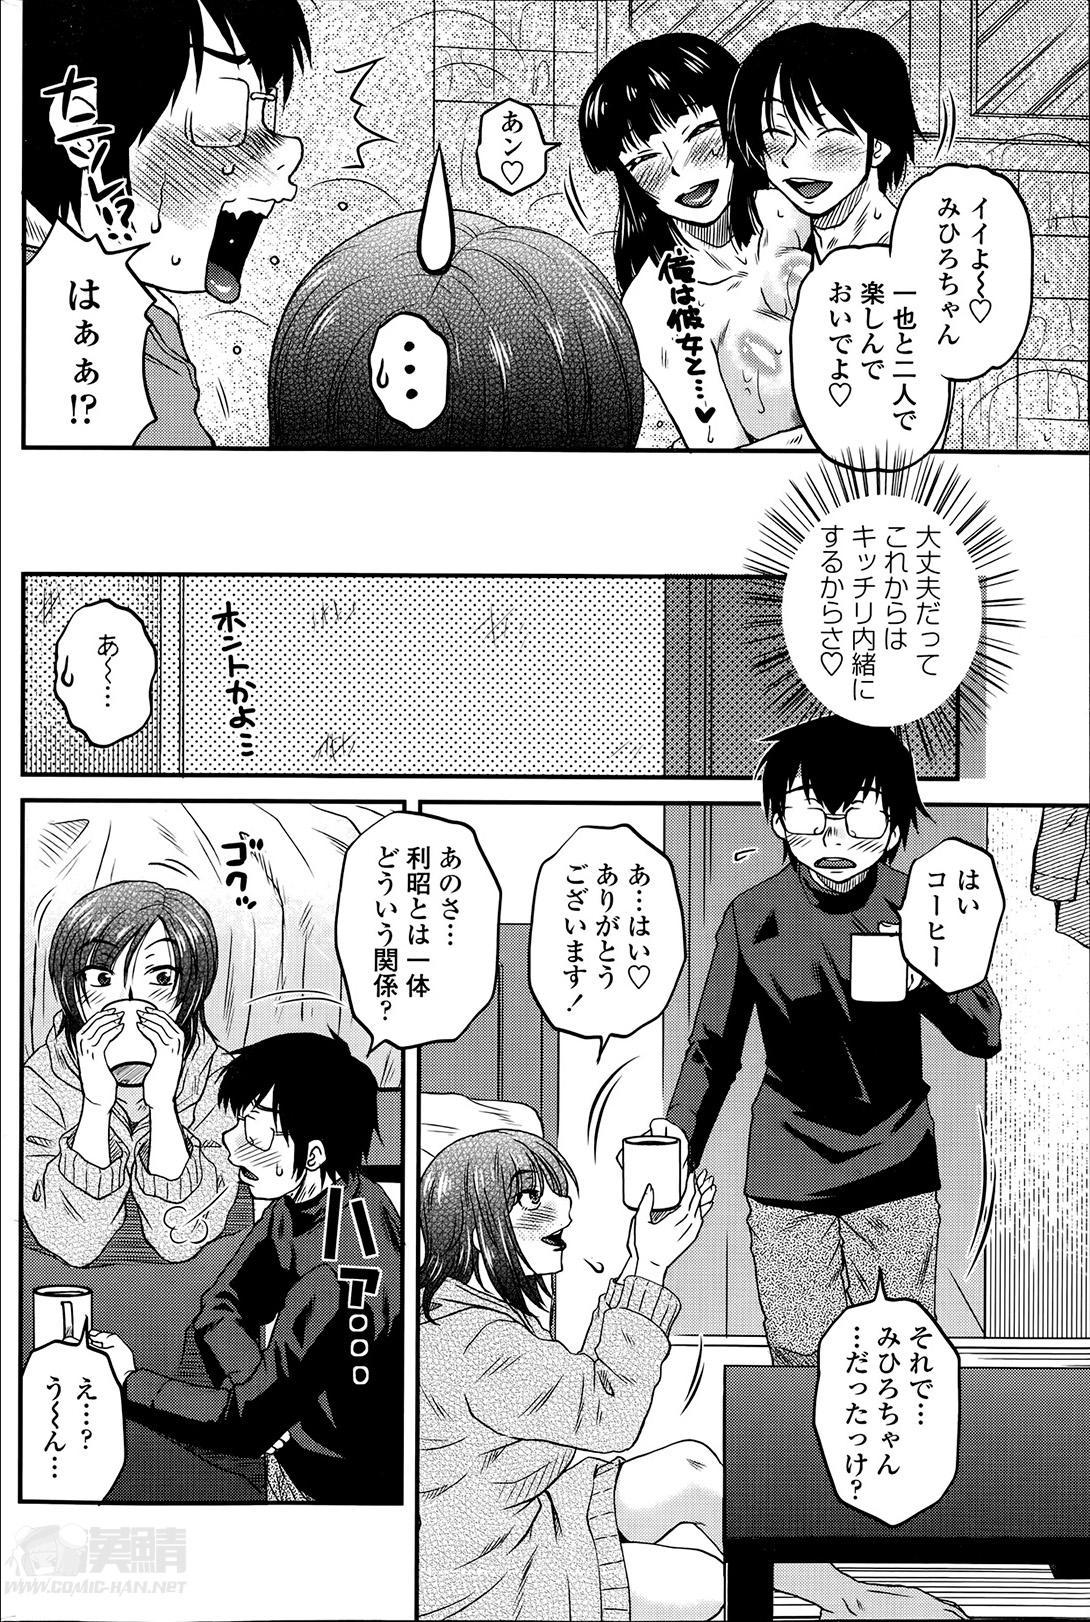 [Kurumiya Mashimin] Mikkai-chuu ni Tsuki Ch.1-6 3